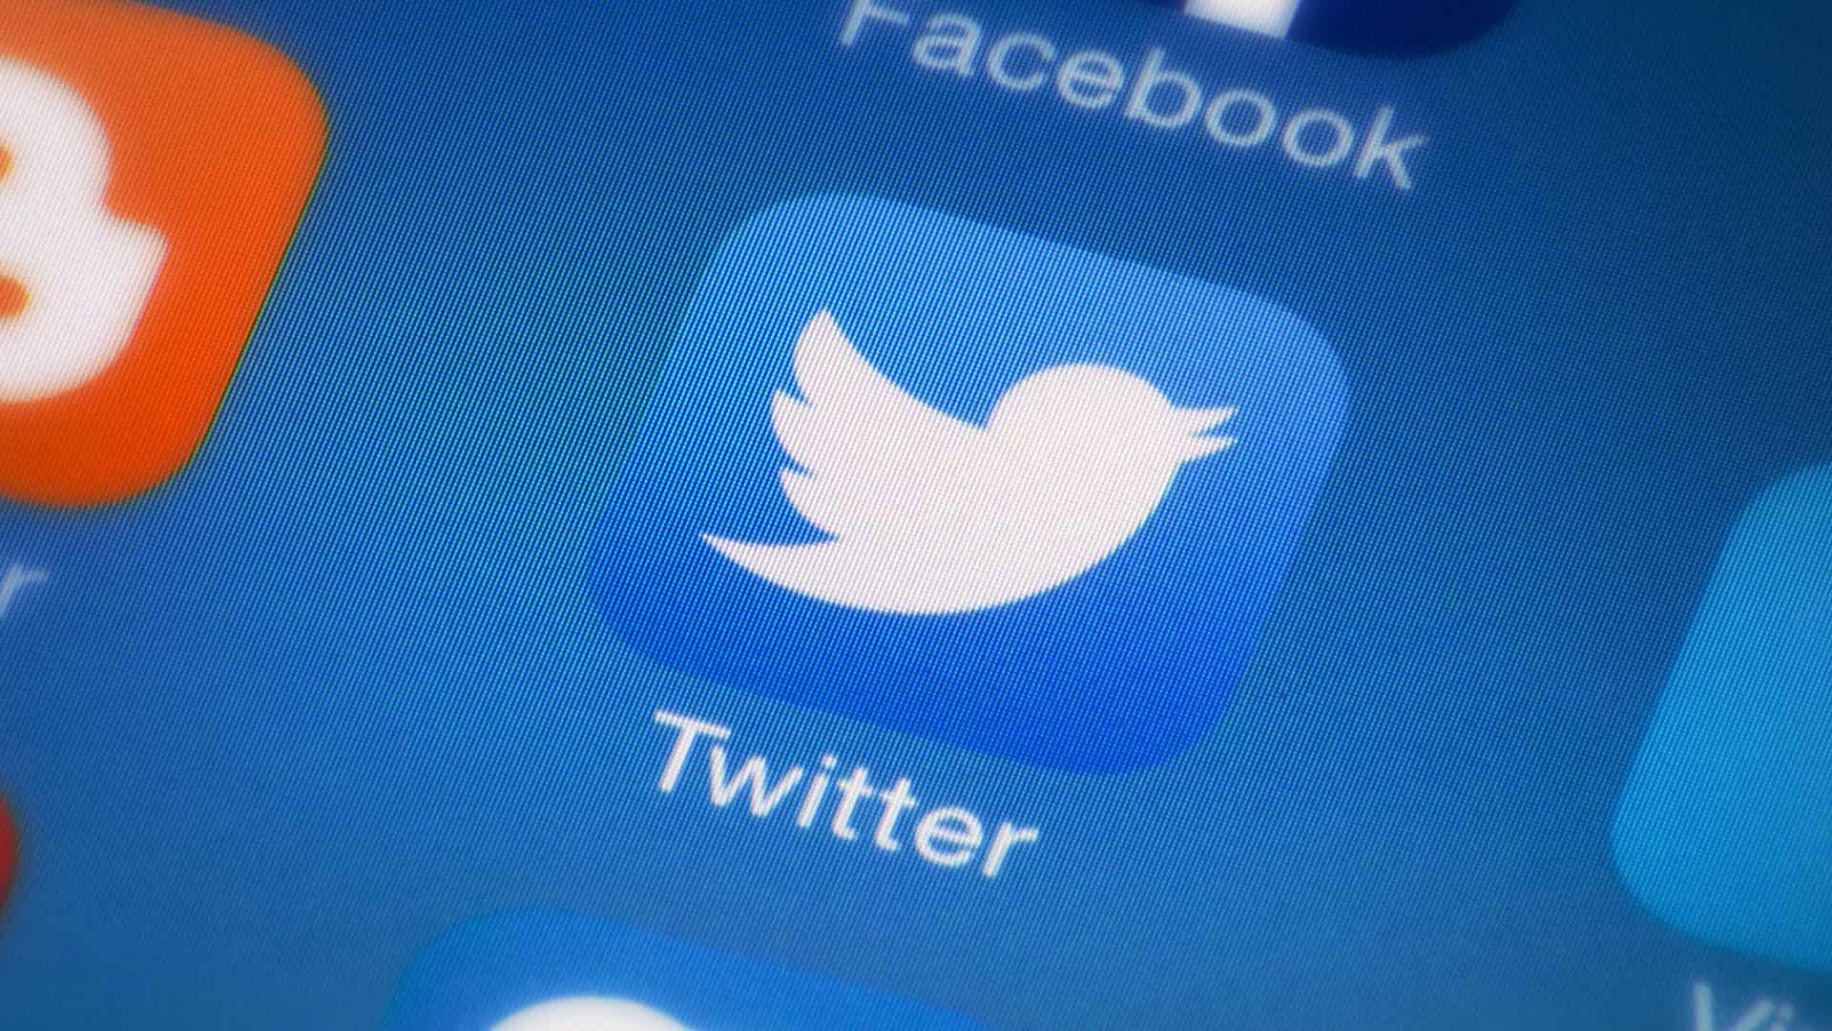 twitter logo on screen with tweetdeck